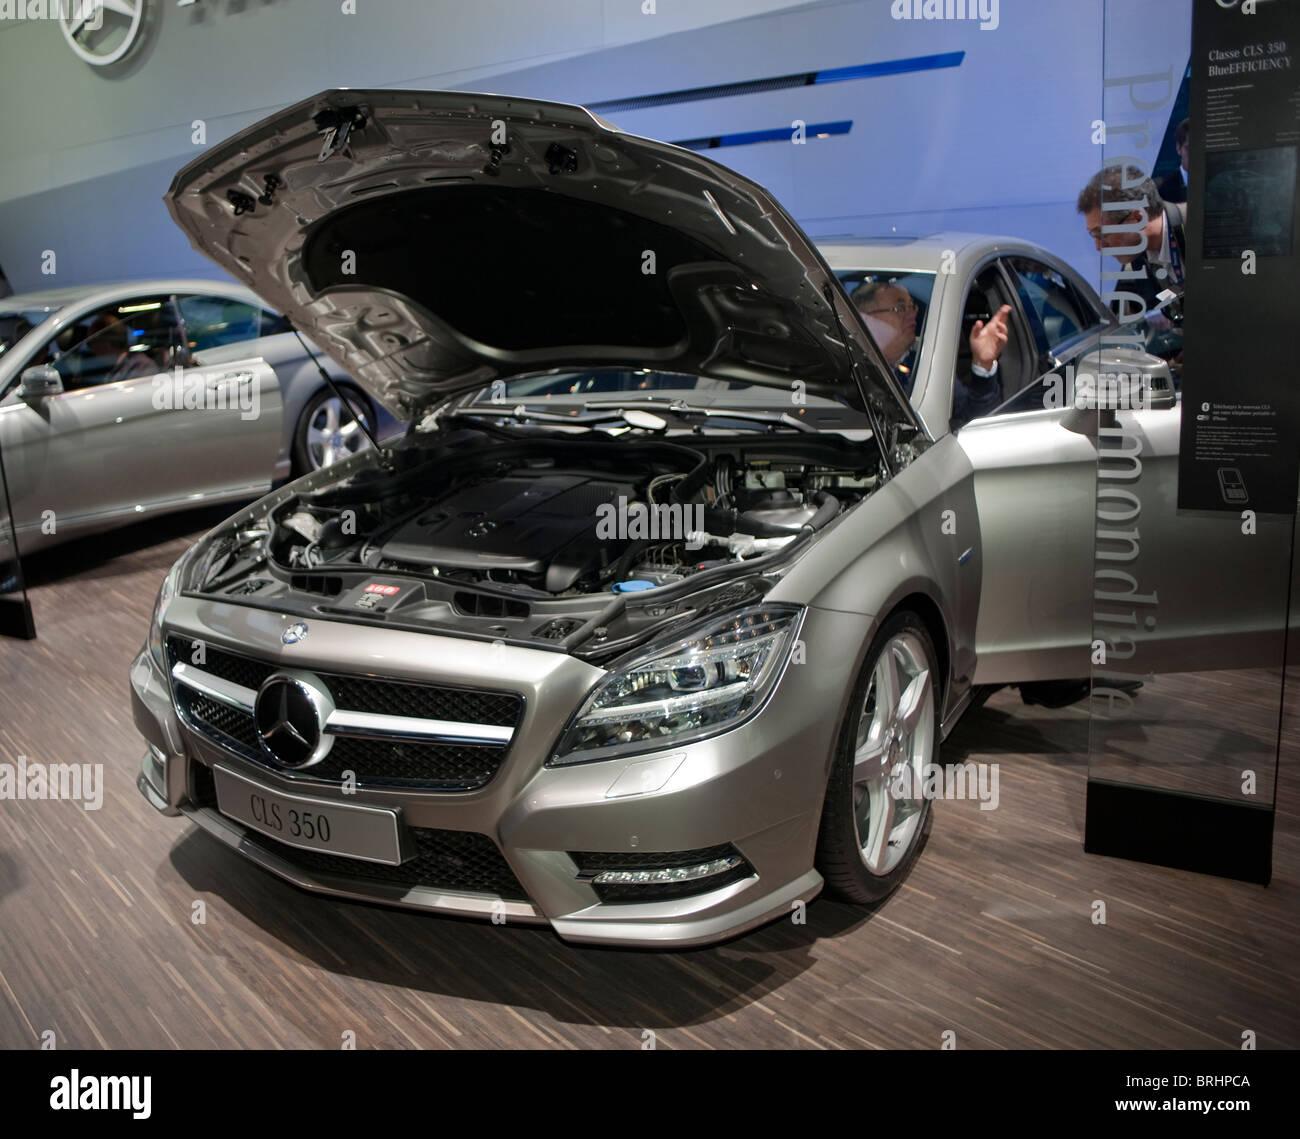 hight resolution of paris france paris car show mercedes benz cls 350 front open hood boot